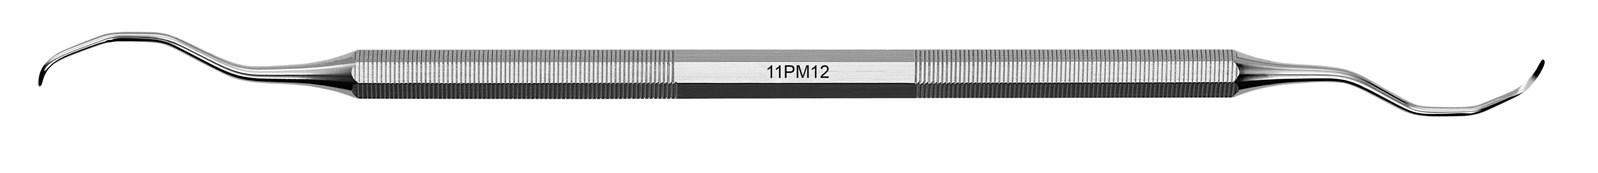 Kyreta Gracey Mini - 11PM12, ADEP světle modrý